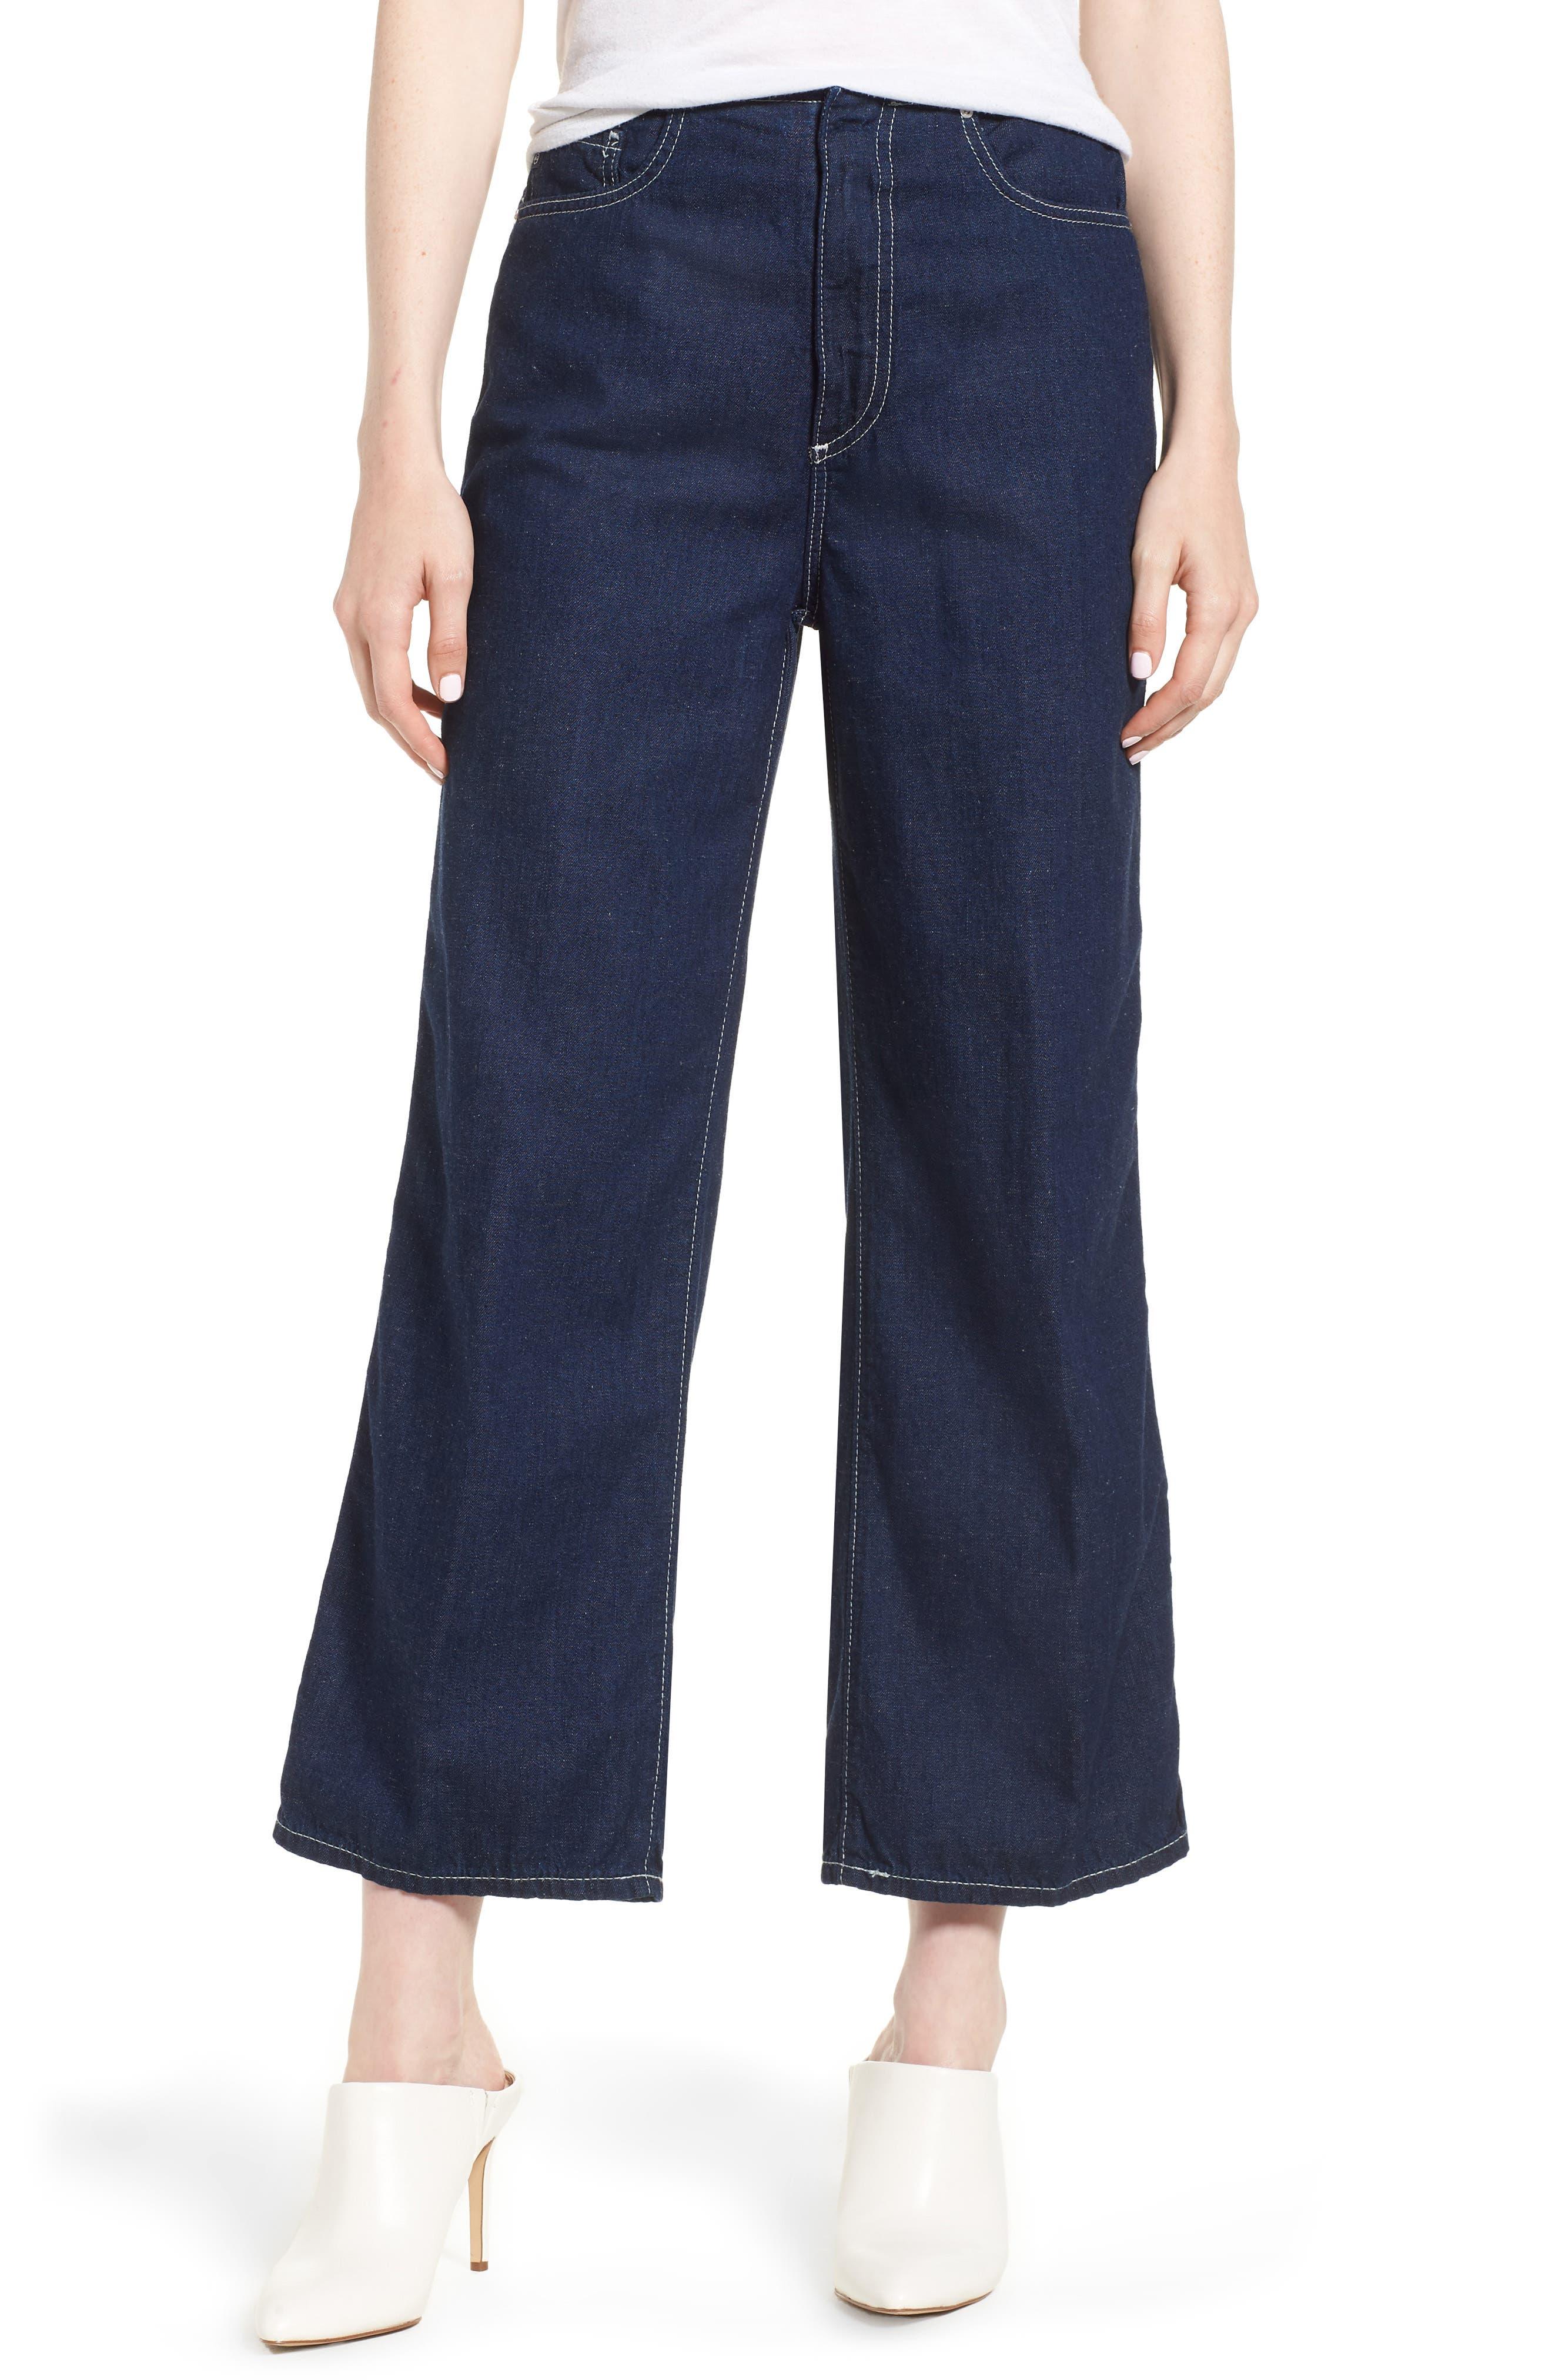 Etta High Waist Crop Wide Leg Jeans,                             Main thumbnail 1, color,                             Midnight Surge